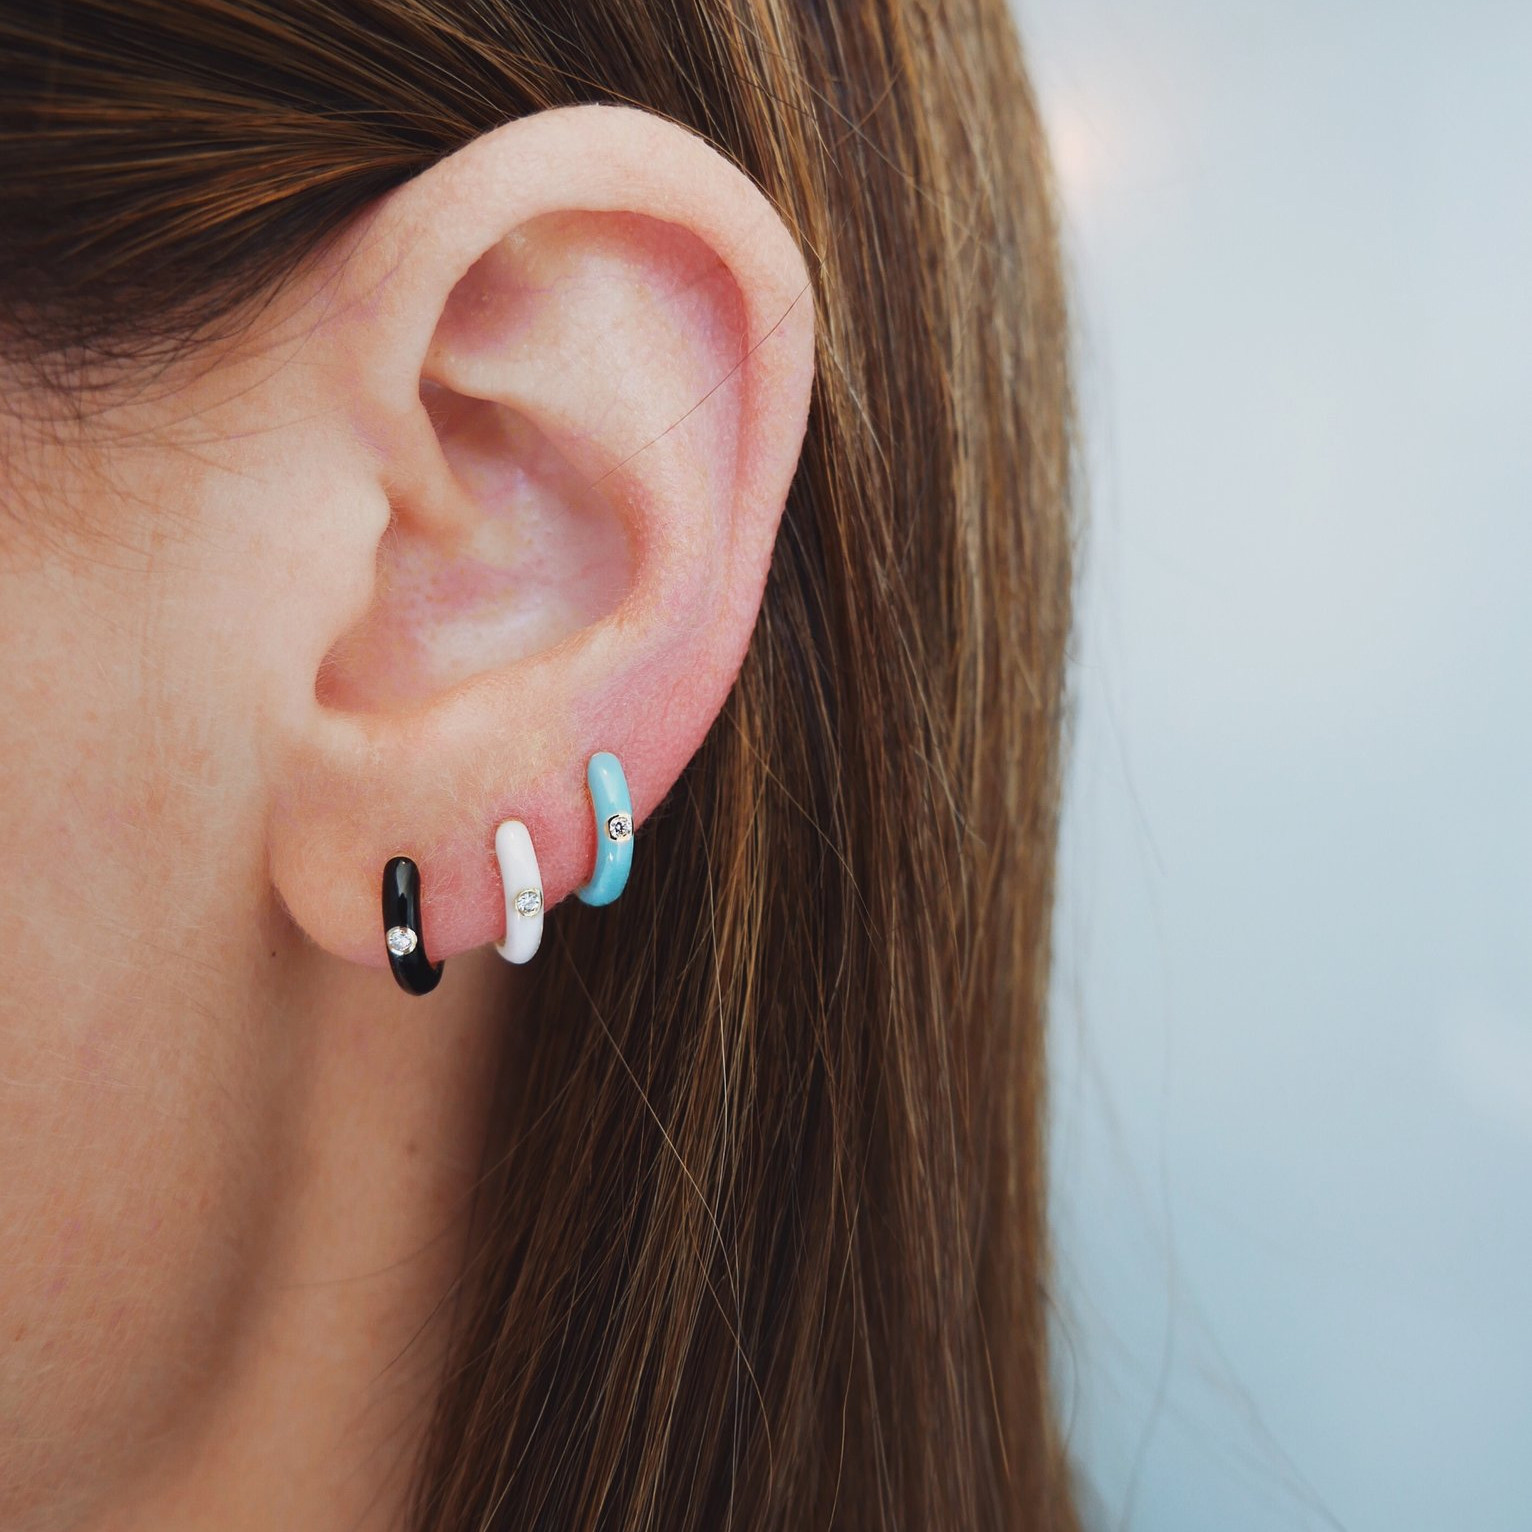 Turquoise Enamel & Diamond Huggie Earrings by EF Collection on Model